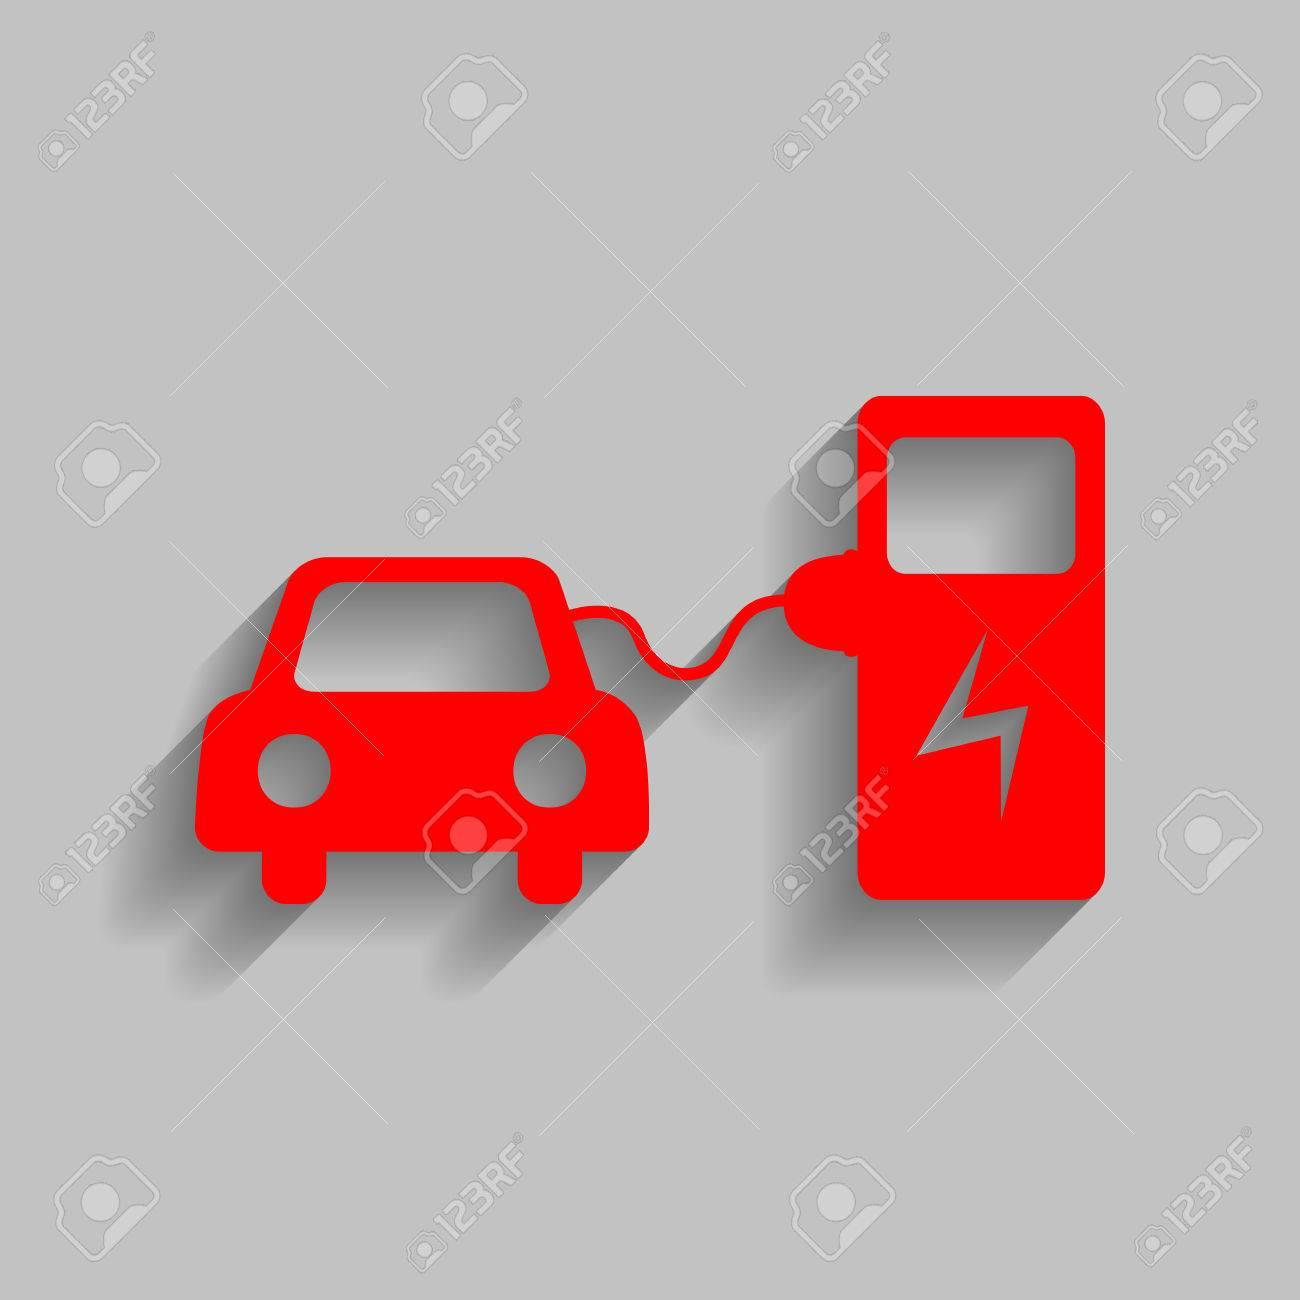 Nett Automobile Elektronische Symbole Galerie - Verdrahtungsideen ...